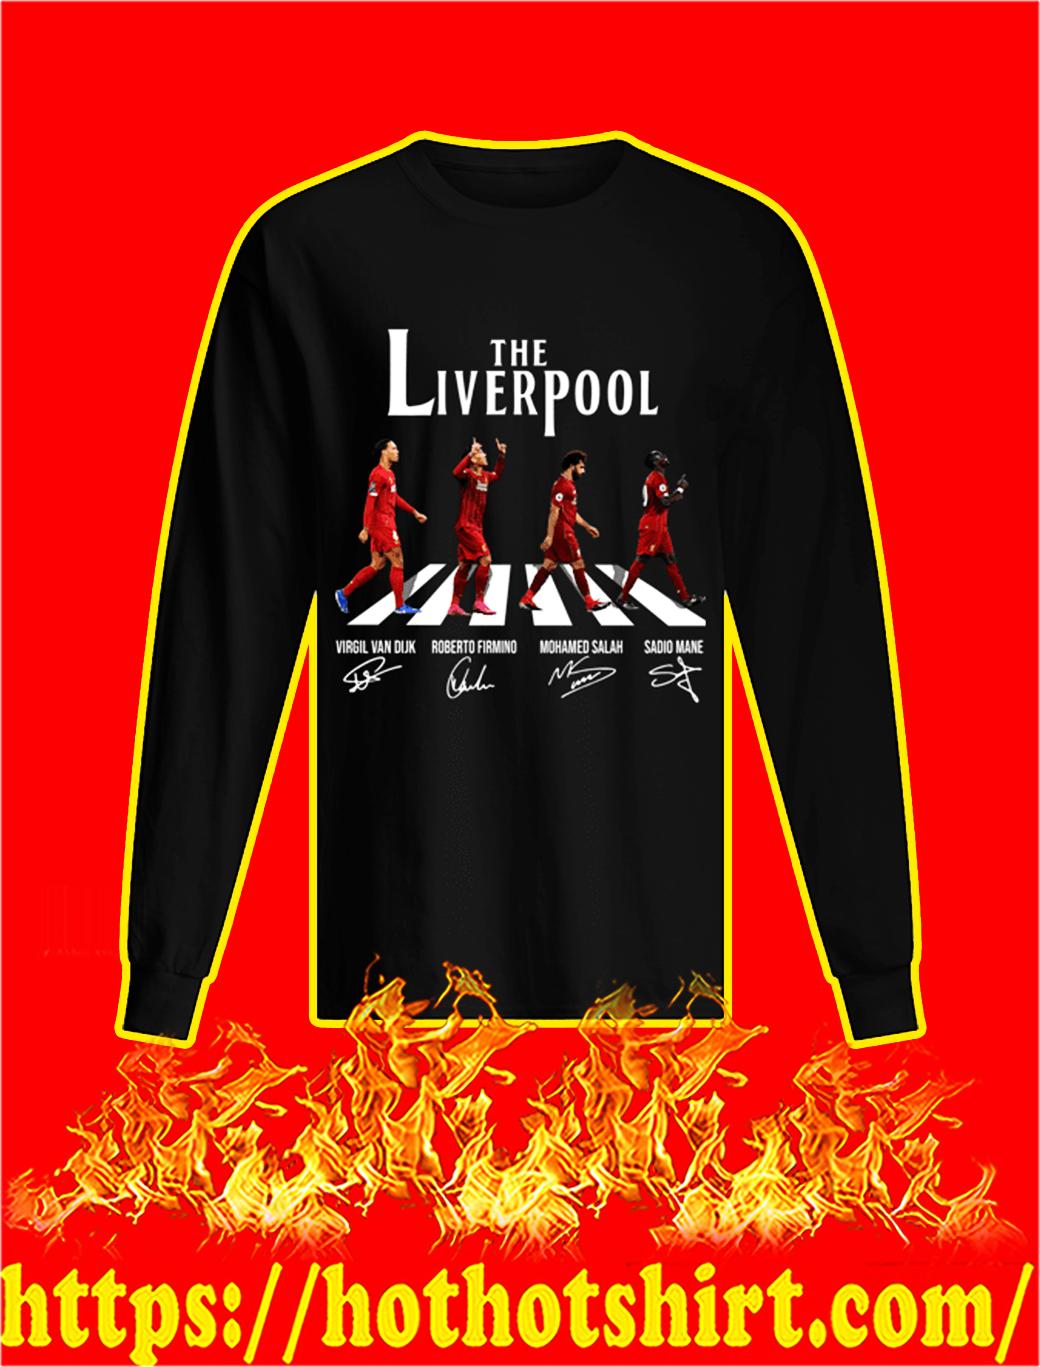 The Liverpool Abbey Road Virgin Firmino Salah Mane Signature longsleeve tee